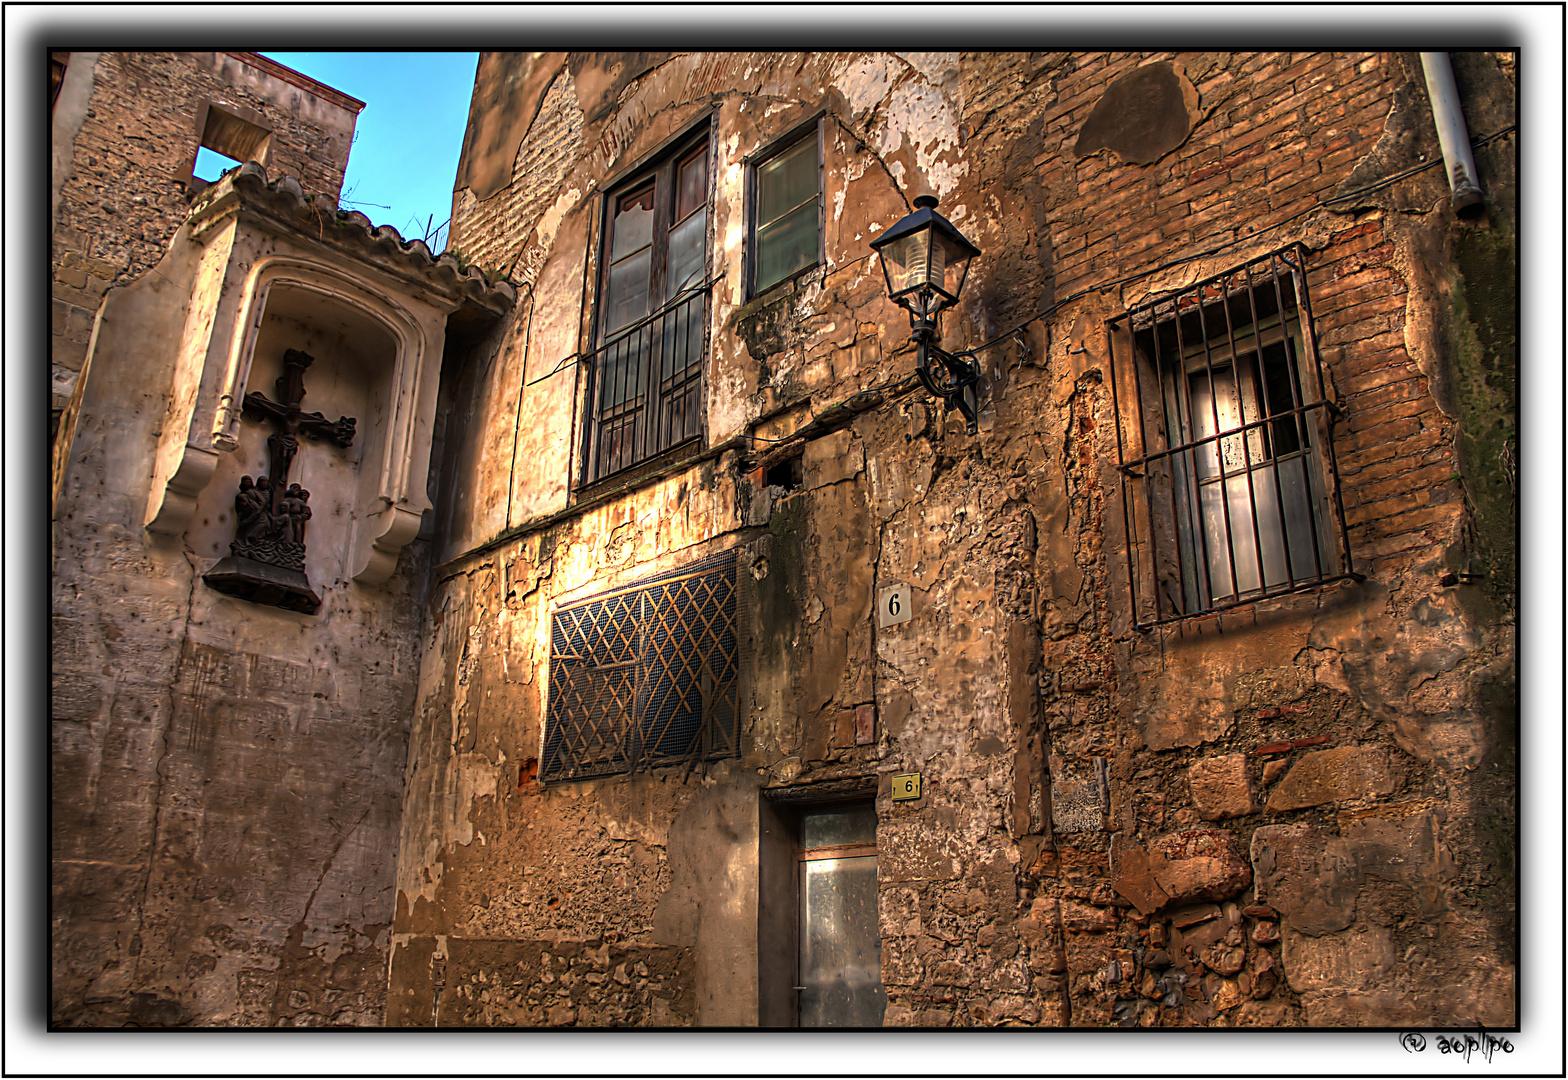 Un rincón cerca de la Catedral de Tortosa